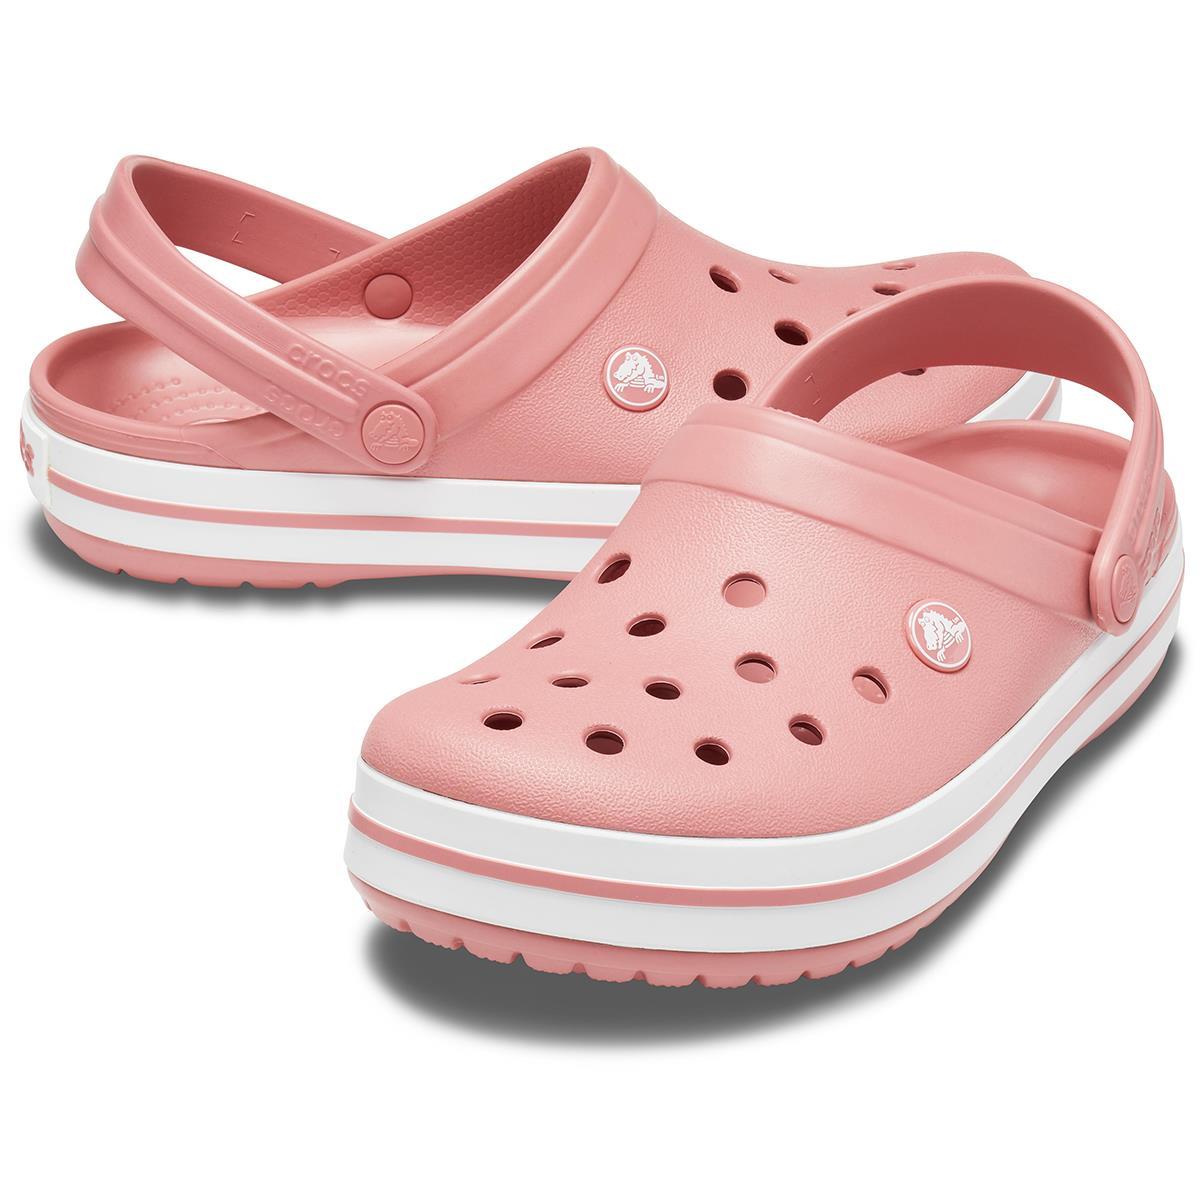 Crocs Crocband Terlik CR0921 6PH